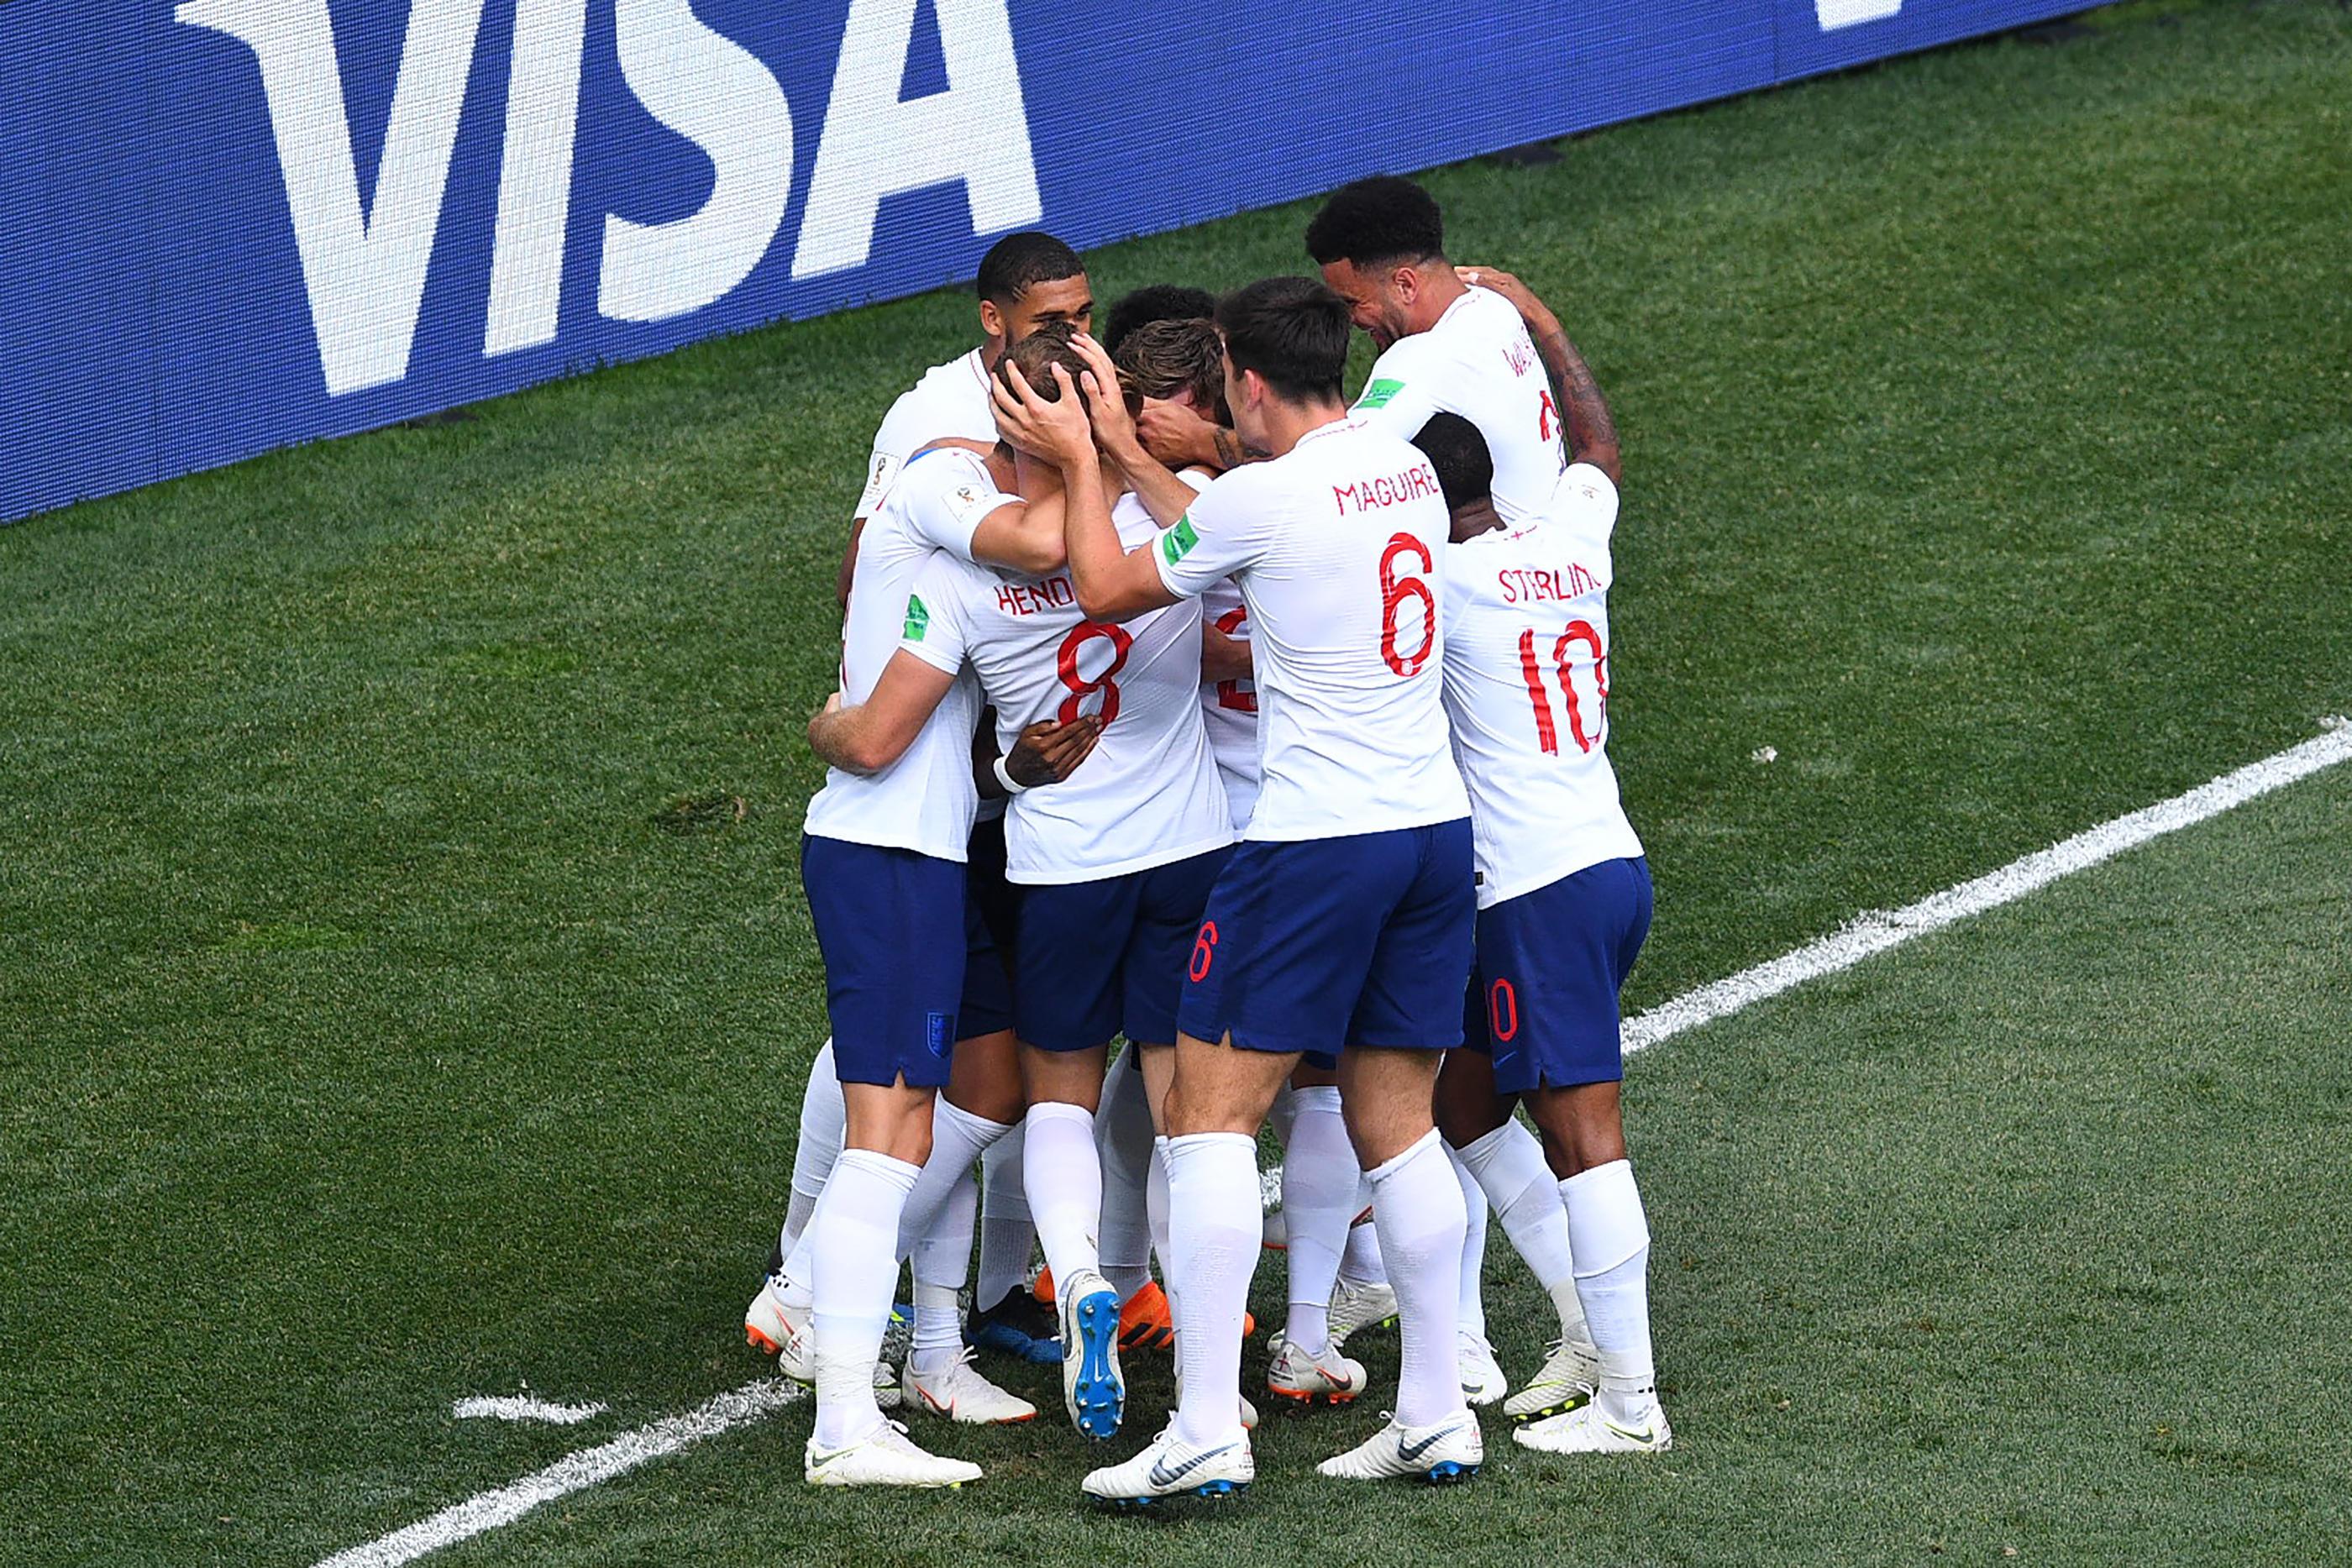 Mondiali 2018: Inghilterra-Panama 6-1, le foto del match